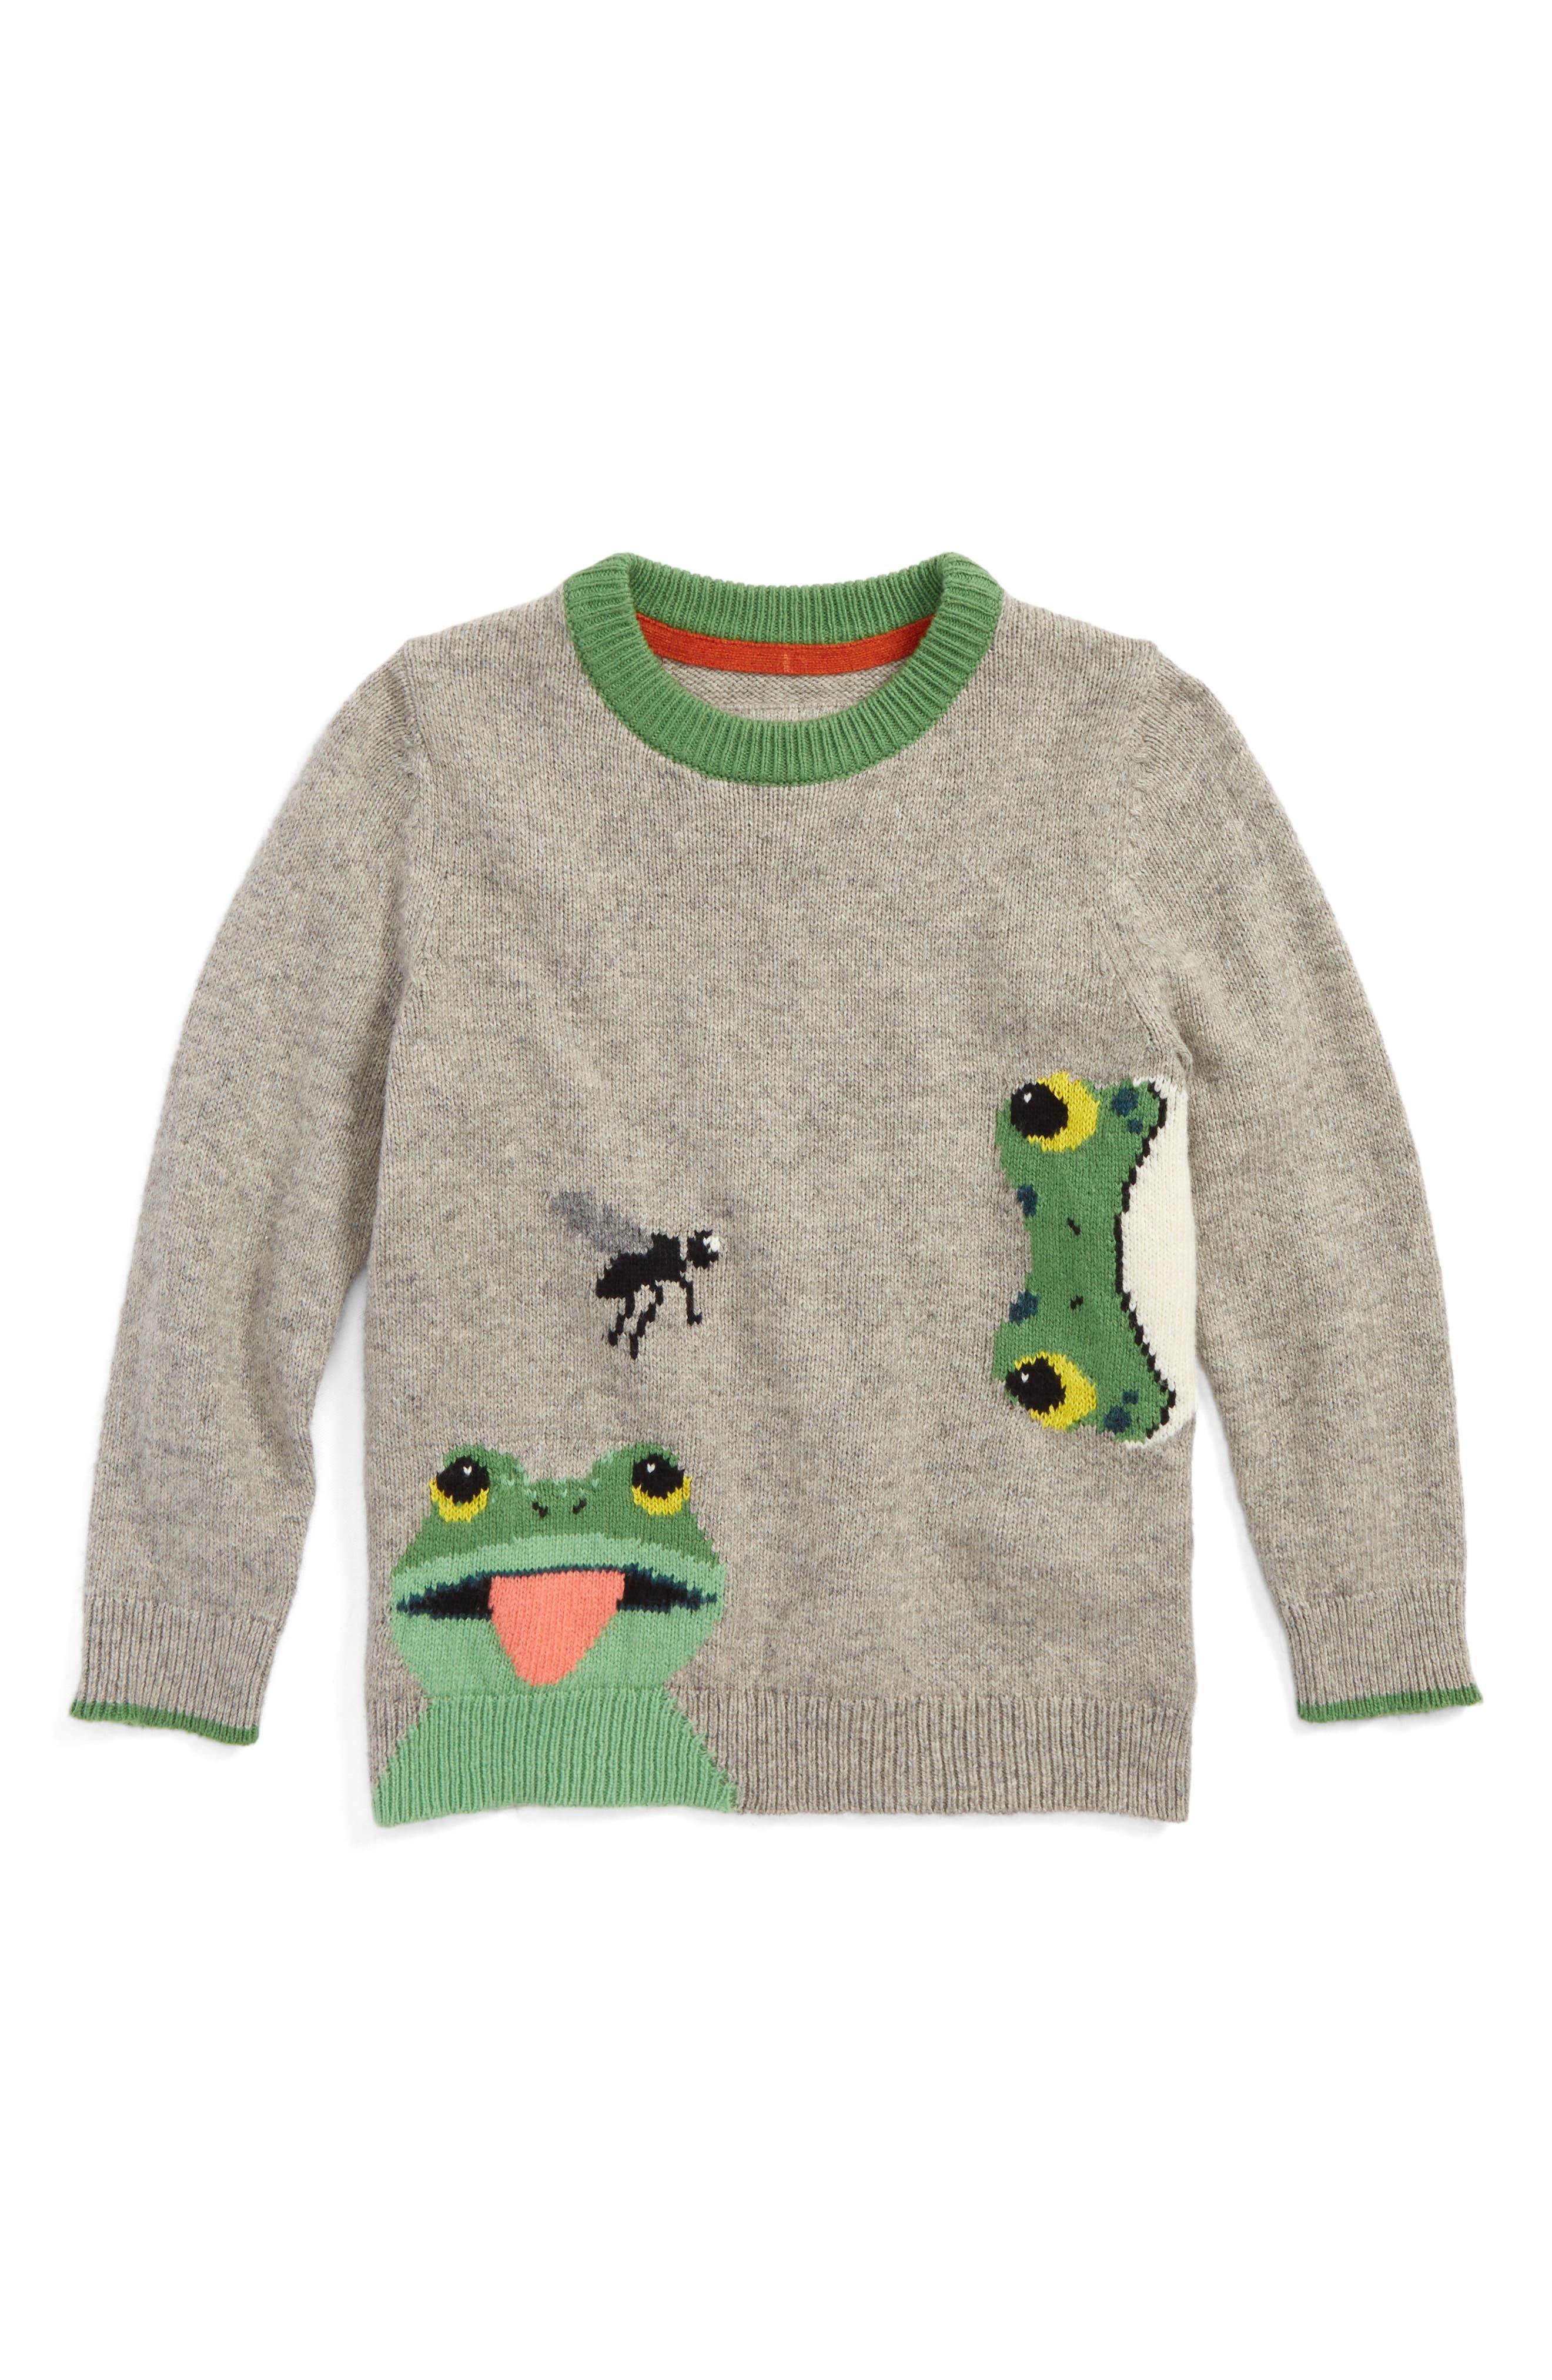 Alternate Image 1 Selected - Mini Boden Wild Adventure Intarsia Sweater (Toddler Boys, Little Boys & Big Boys)